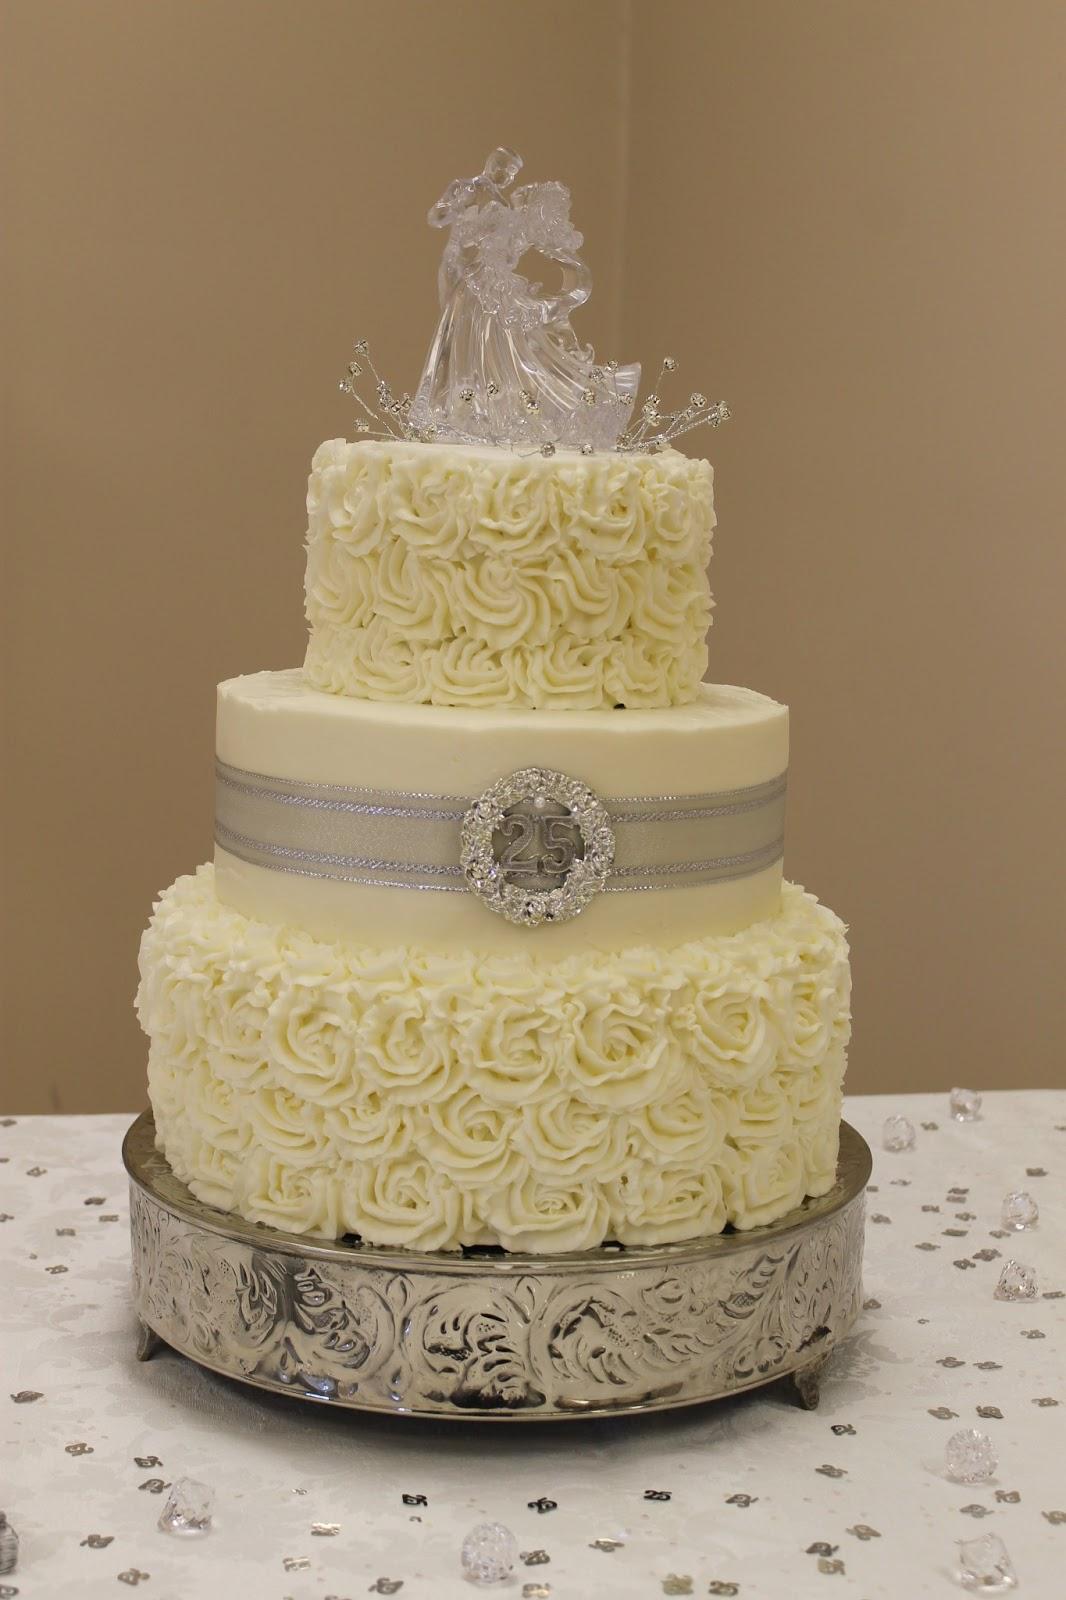 The Simple Cake Silver Wedding Anniversary Cake